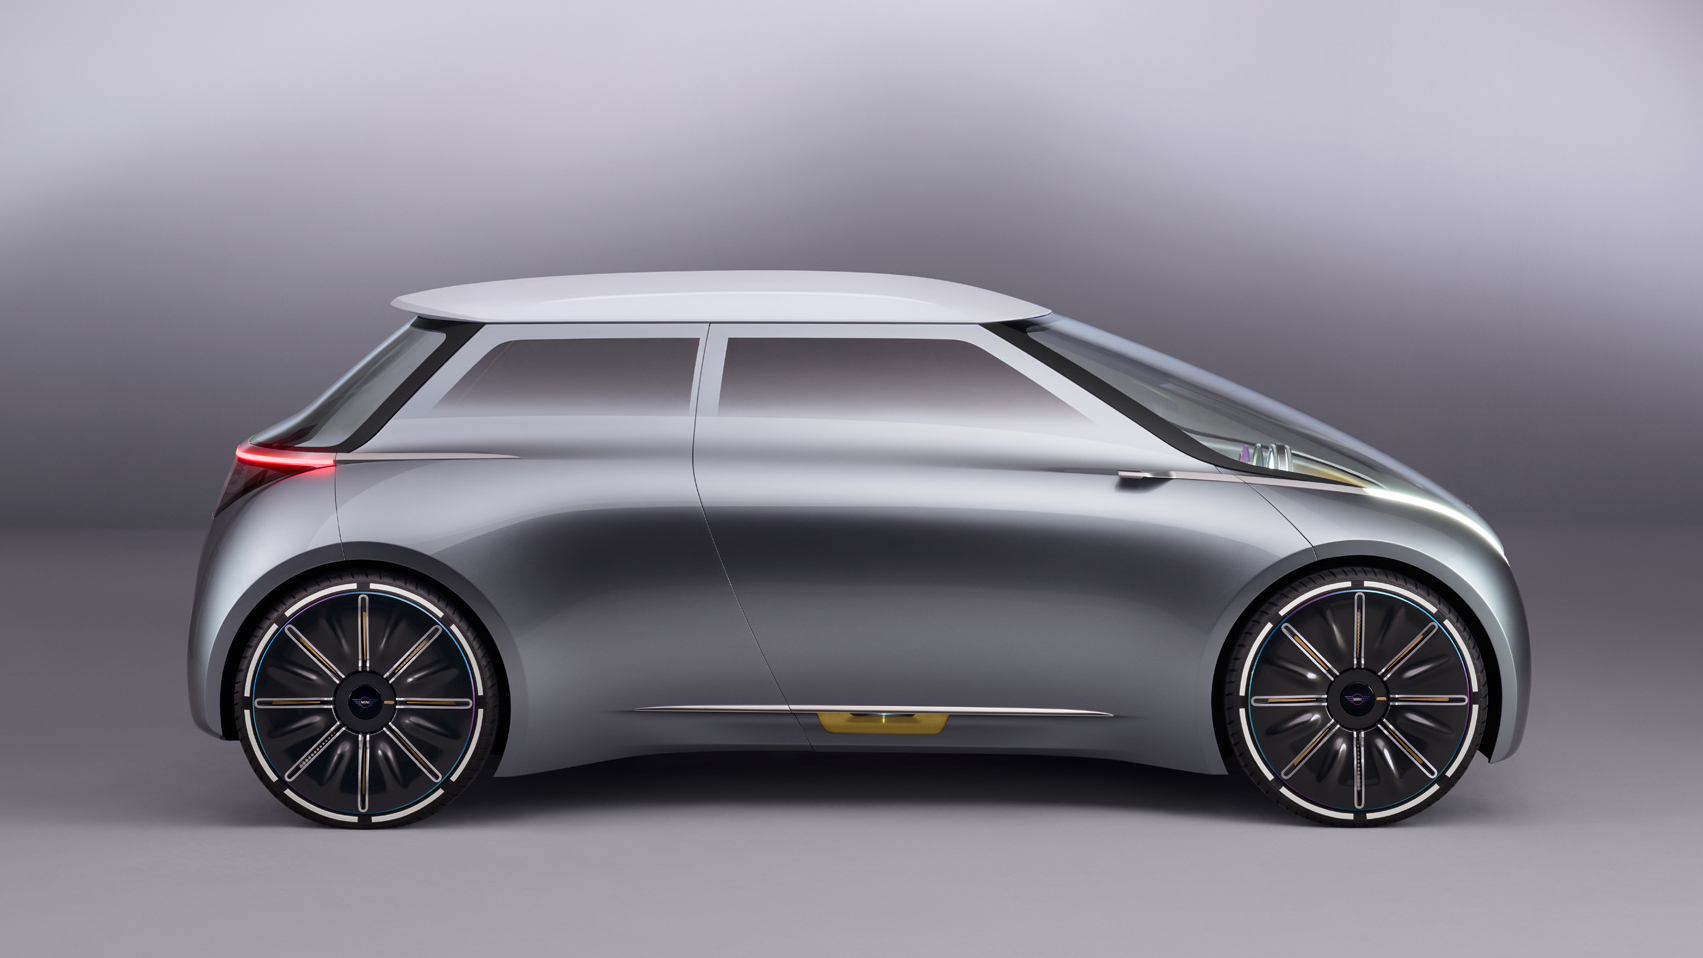 Minis Concept Car Changes Colour Depending On Your Mood